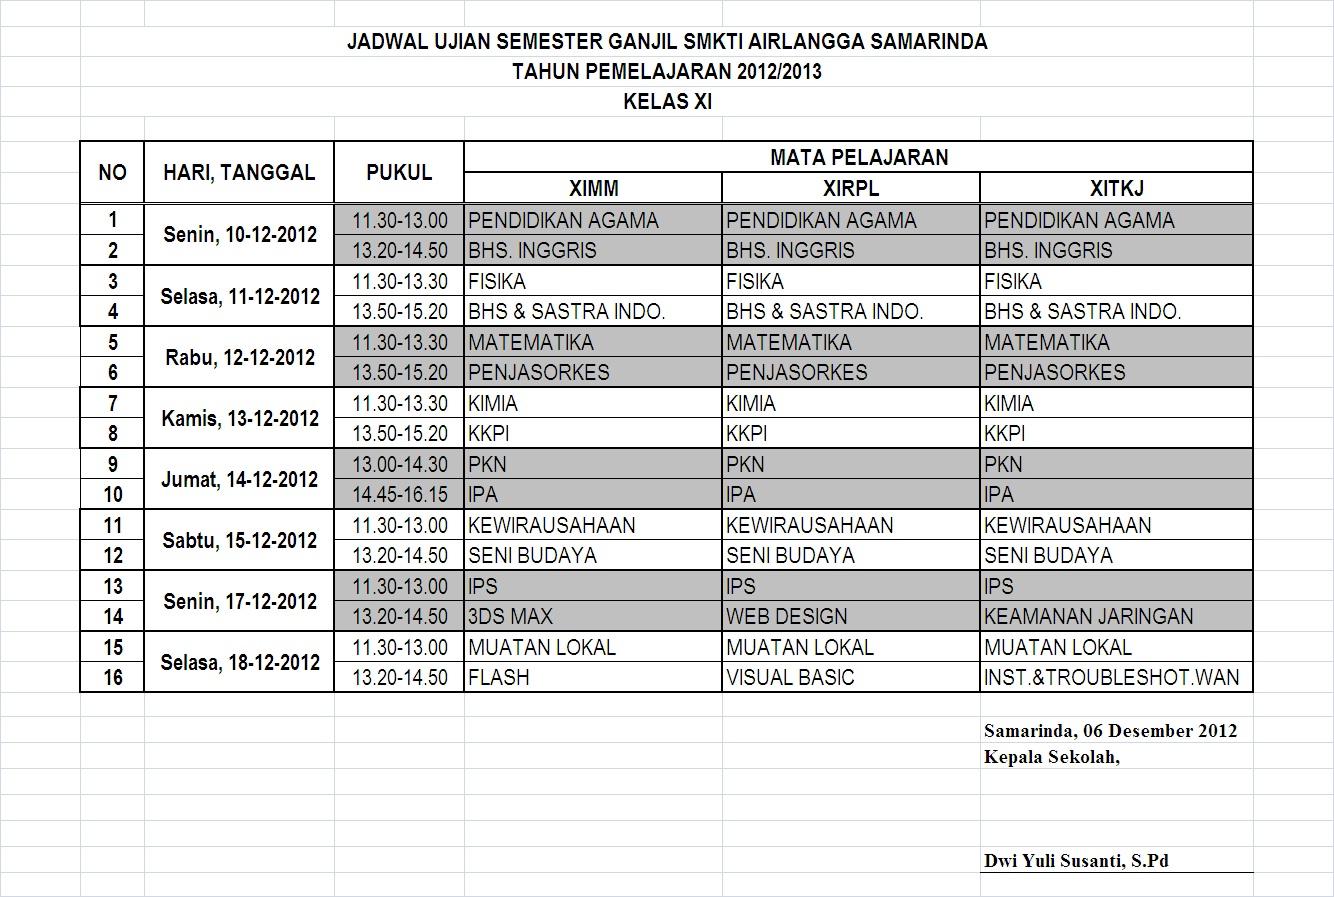 SMK TI Airlangga Samarinda: Jadwal Ujian Semester Ganjil